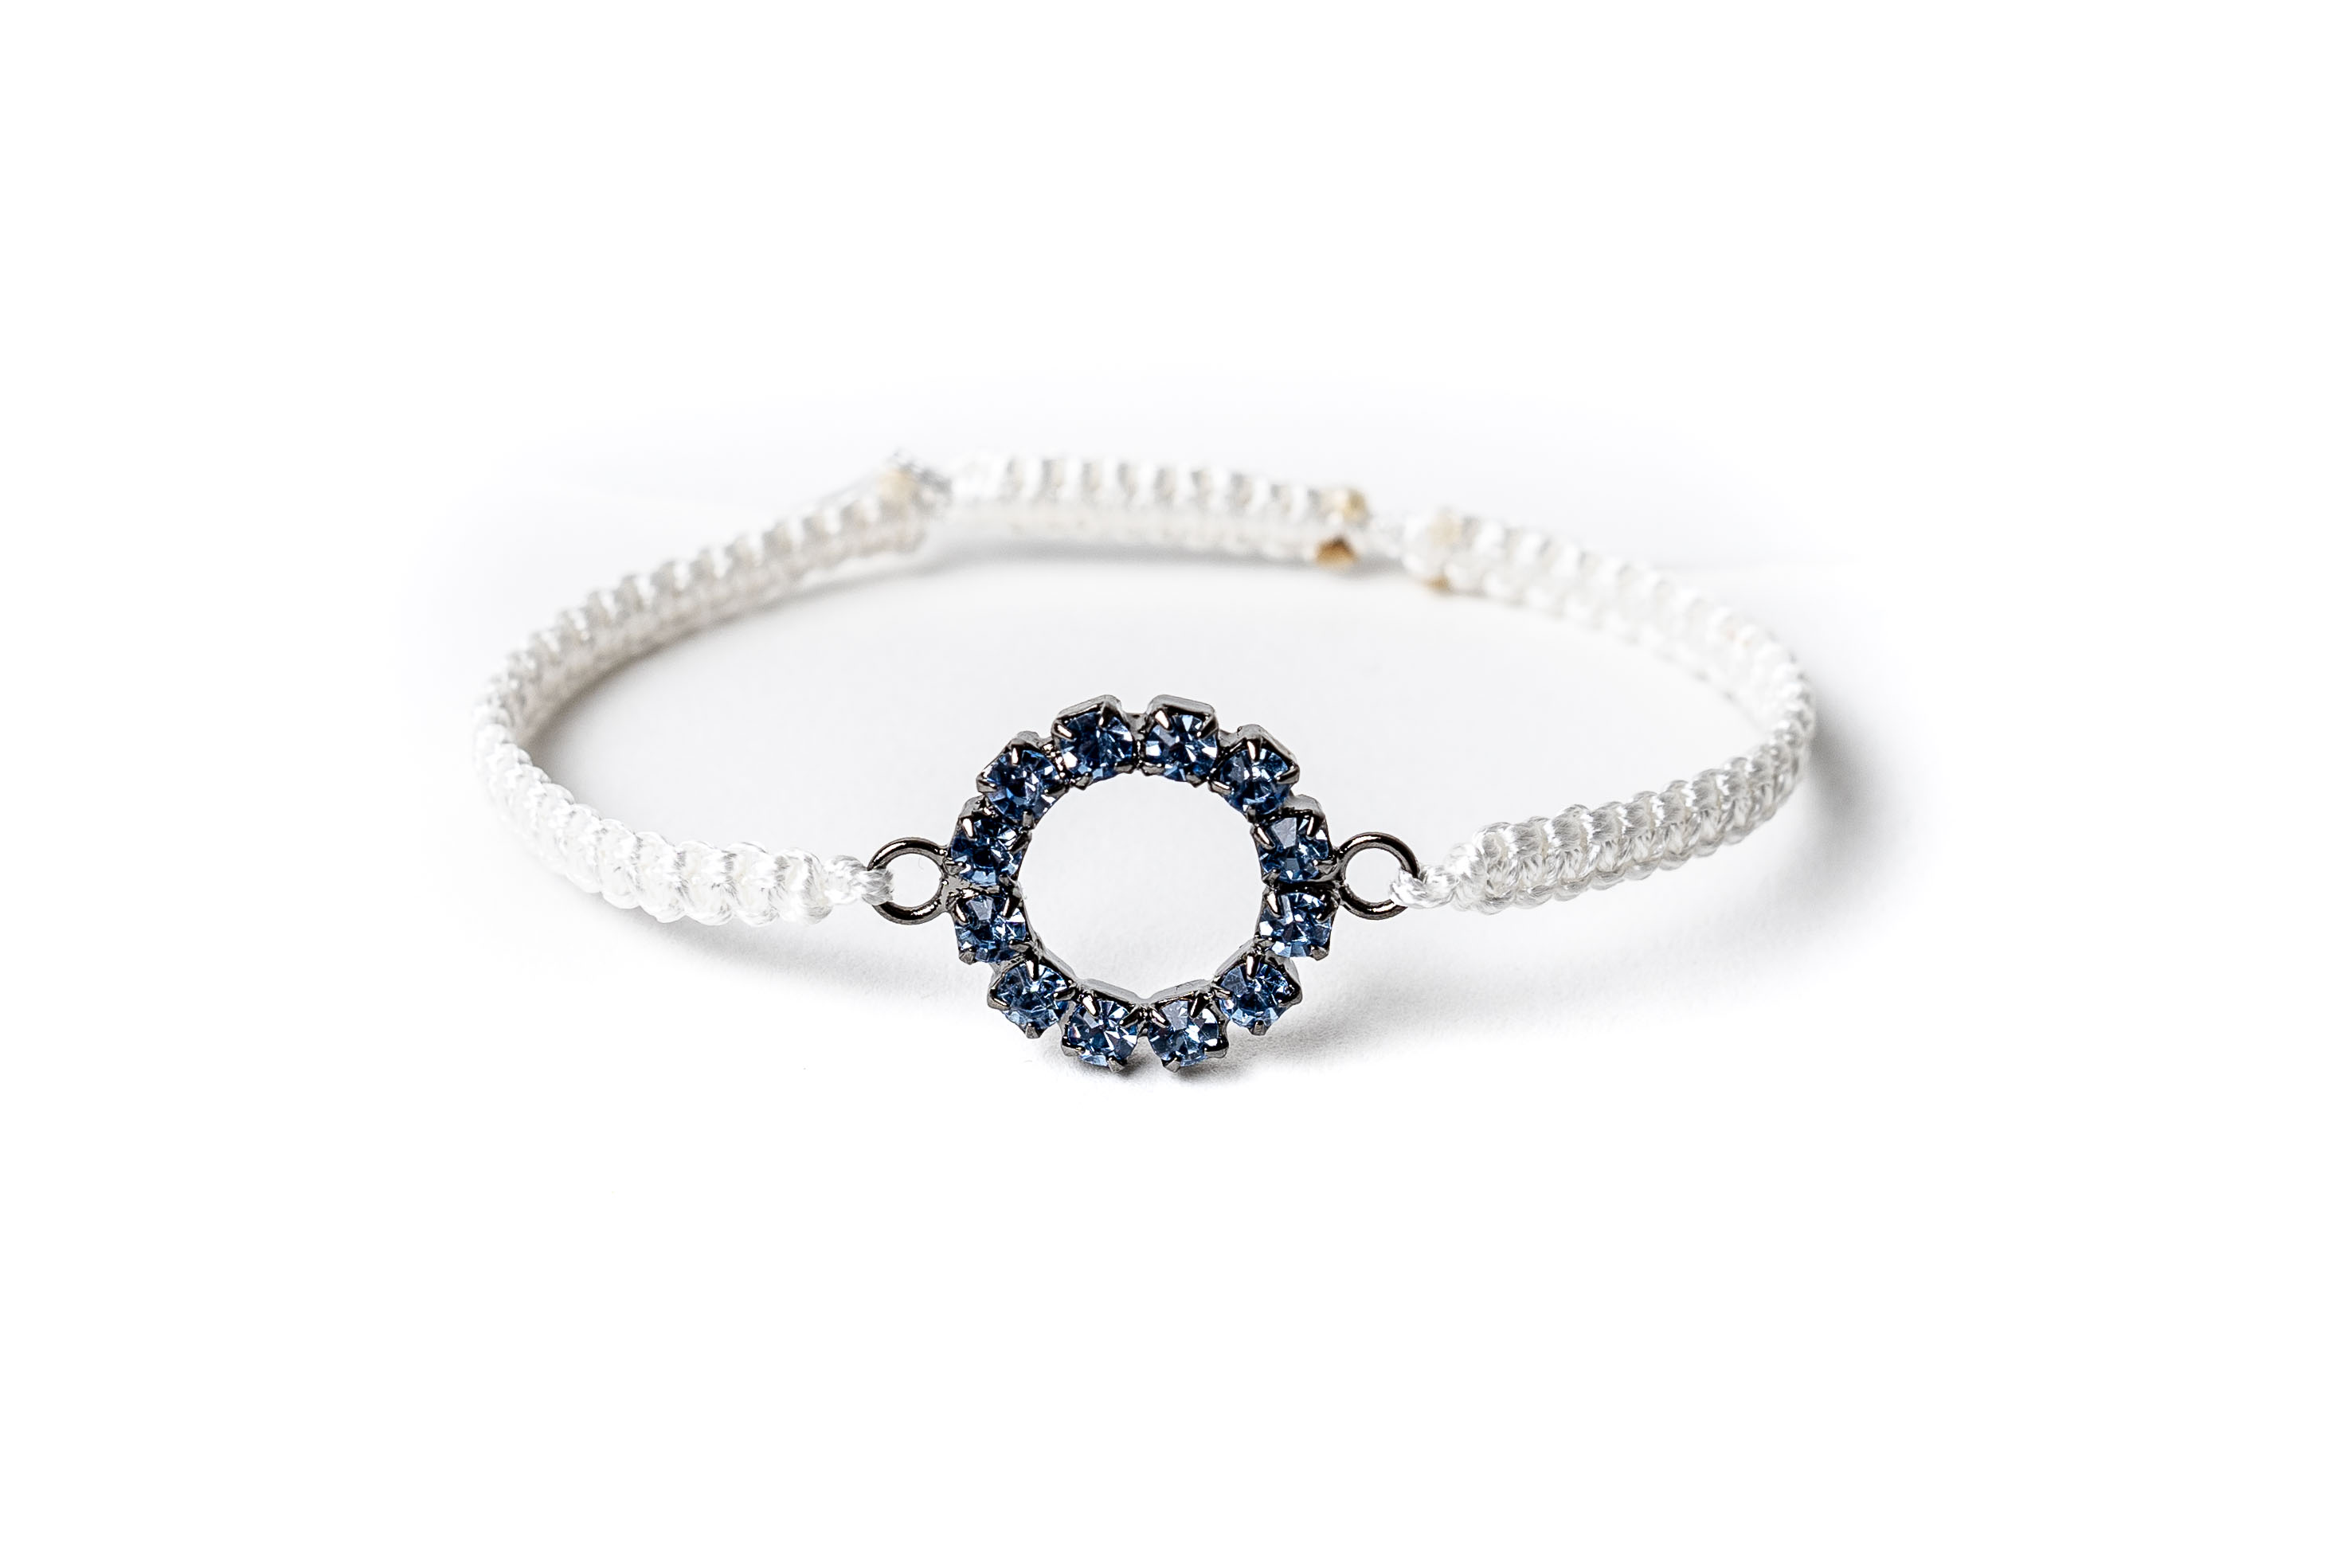 Macramé náramek kolečko s modrými krystaly Bílá, Pánský náramek